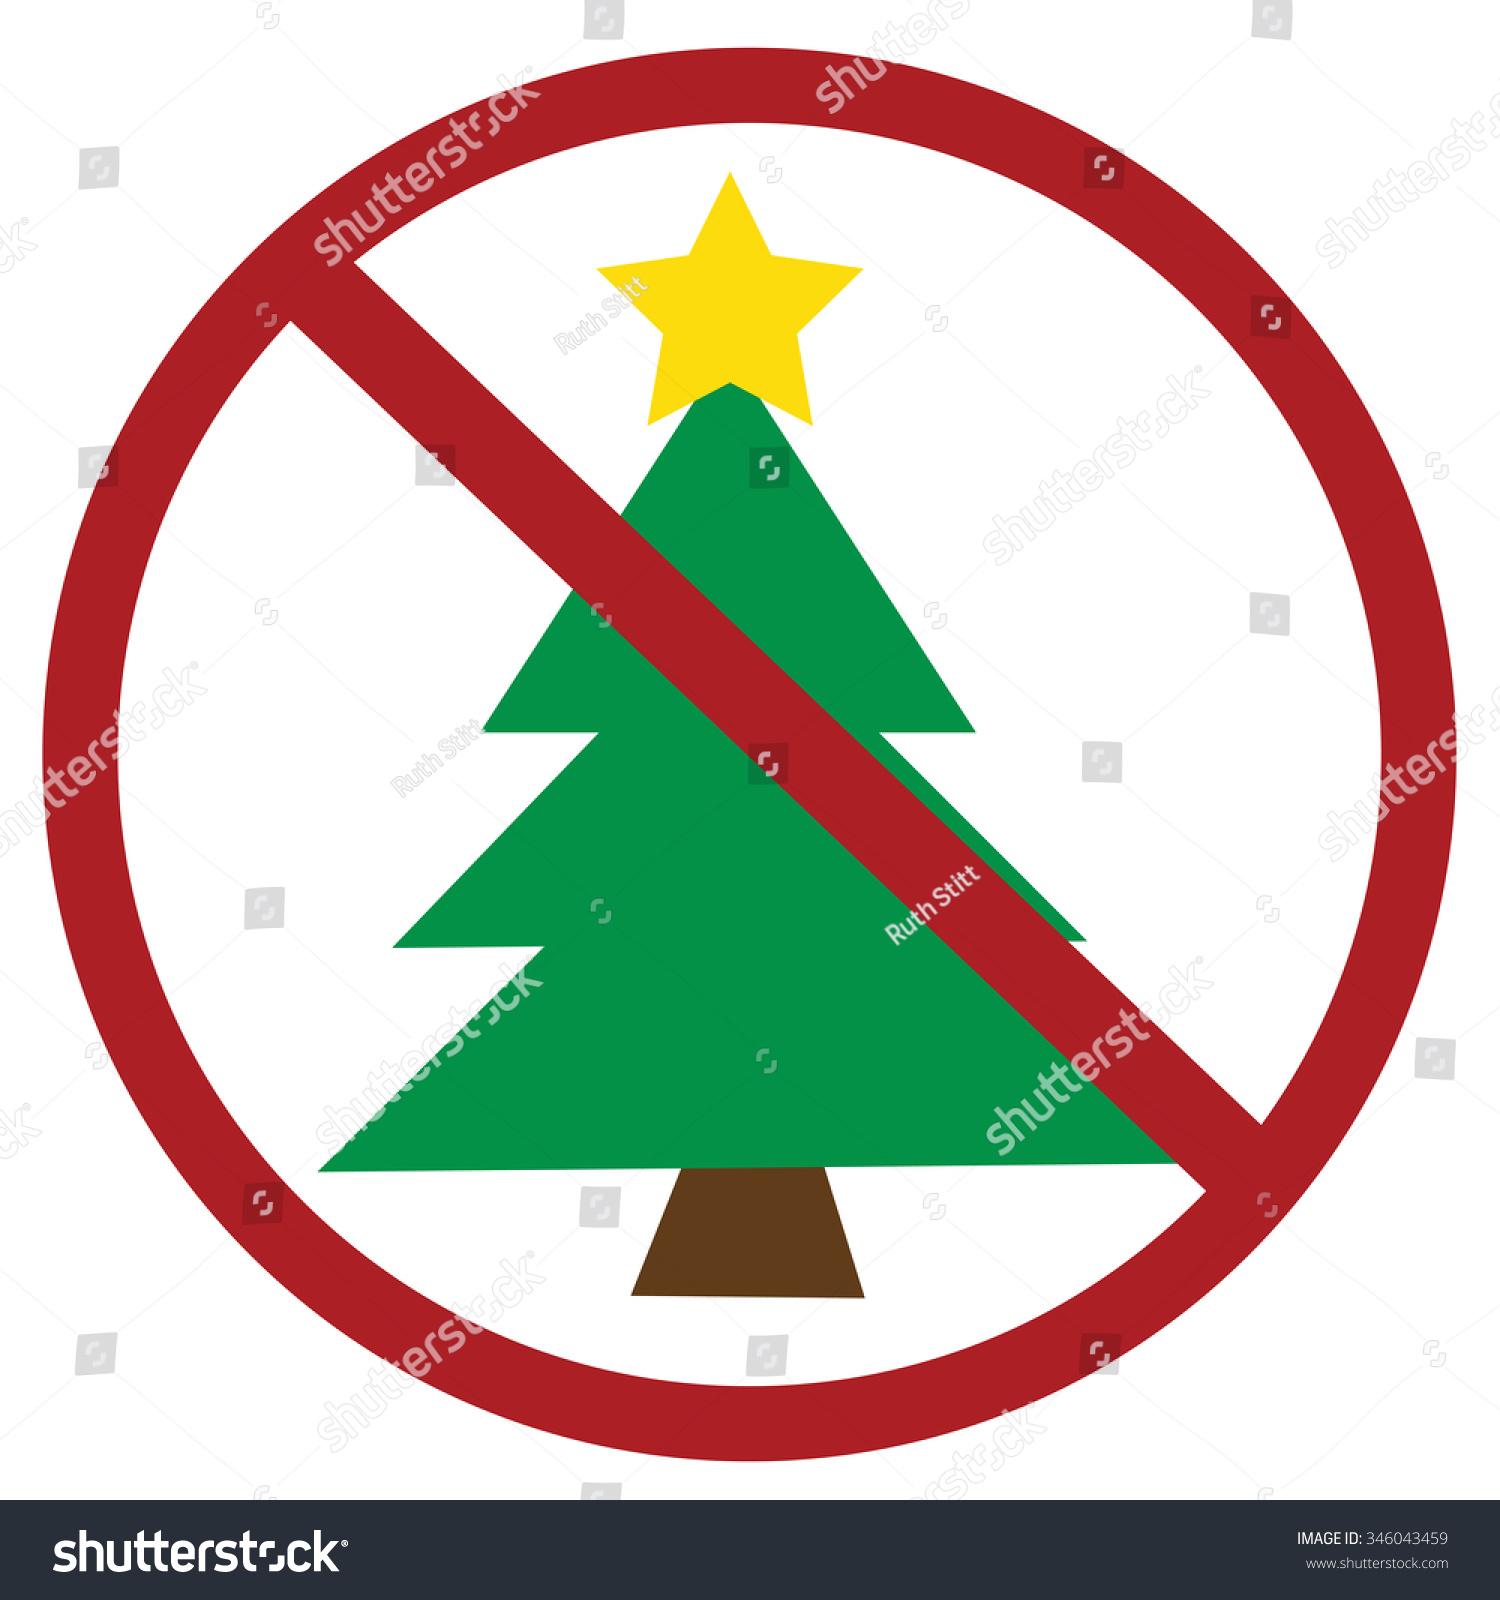 No Christmas Stock Illustration 346043459 - Shutterstock